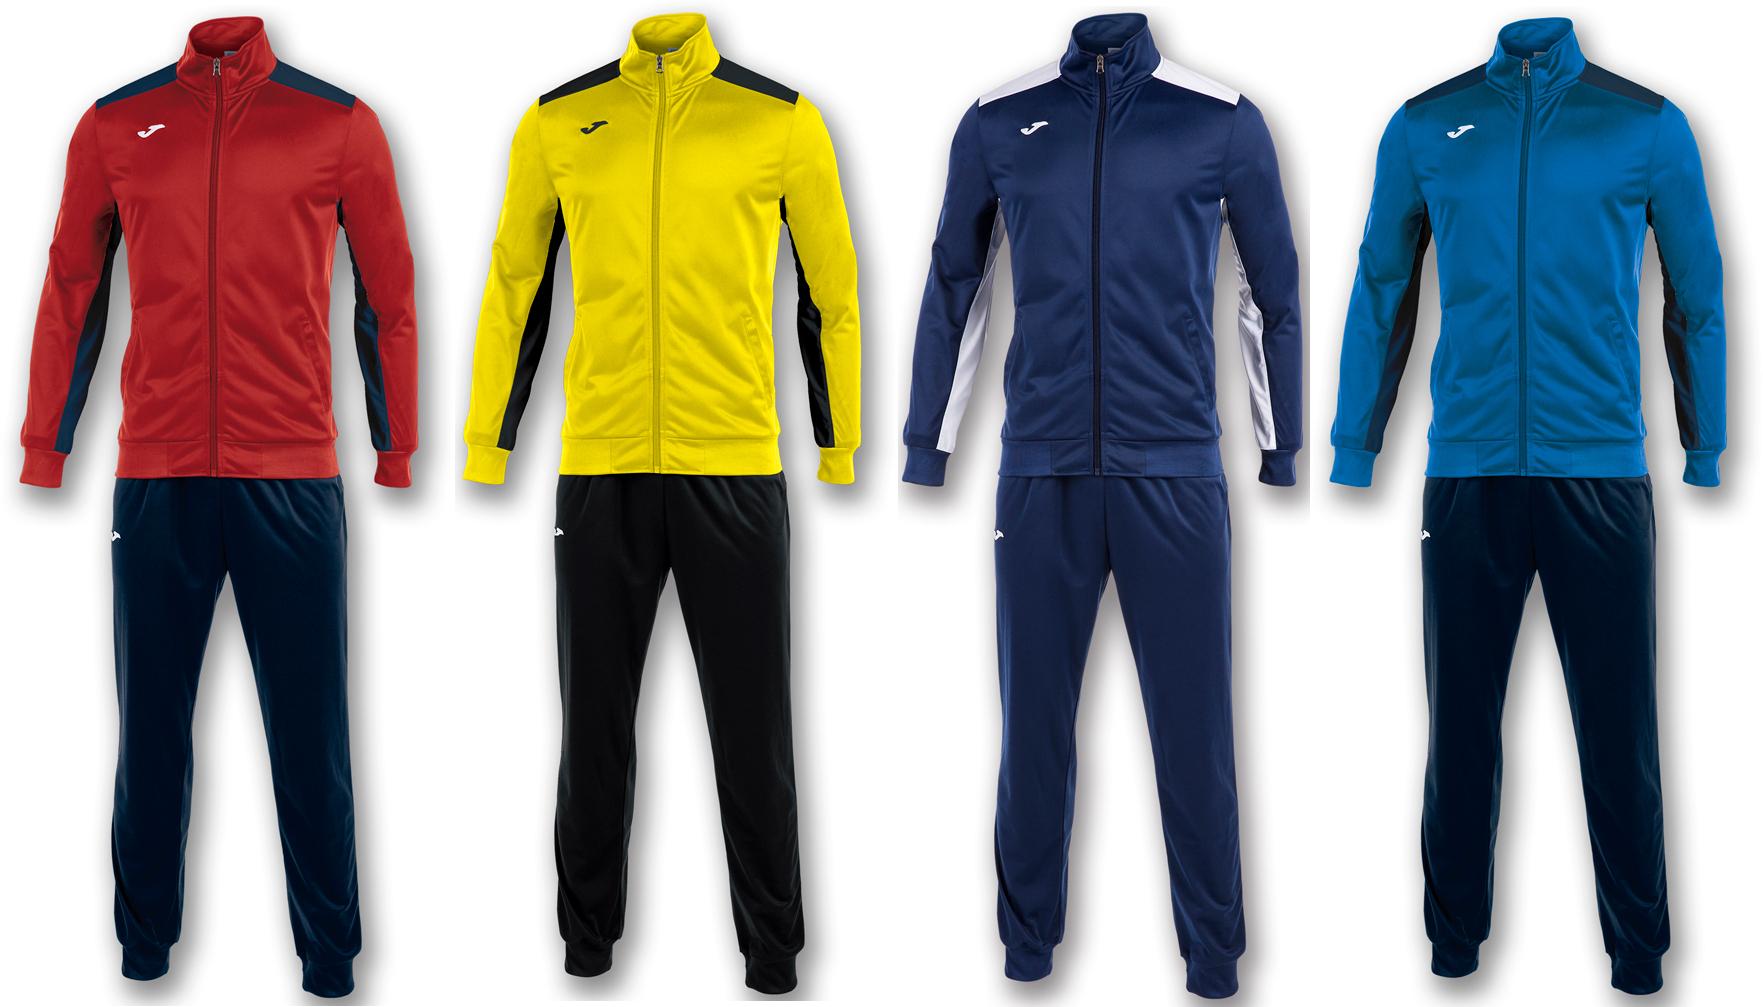 [@sportspar] Joma Trainingsanzug Academy Tracksuit für 20,94€ frei Haus